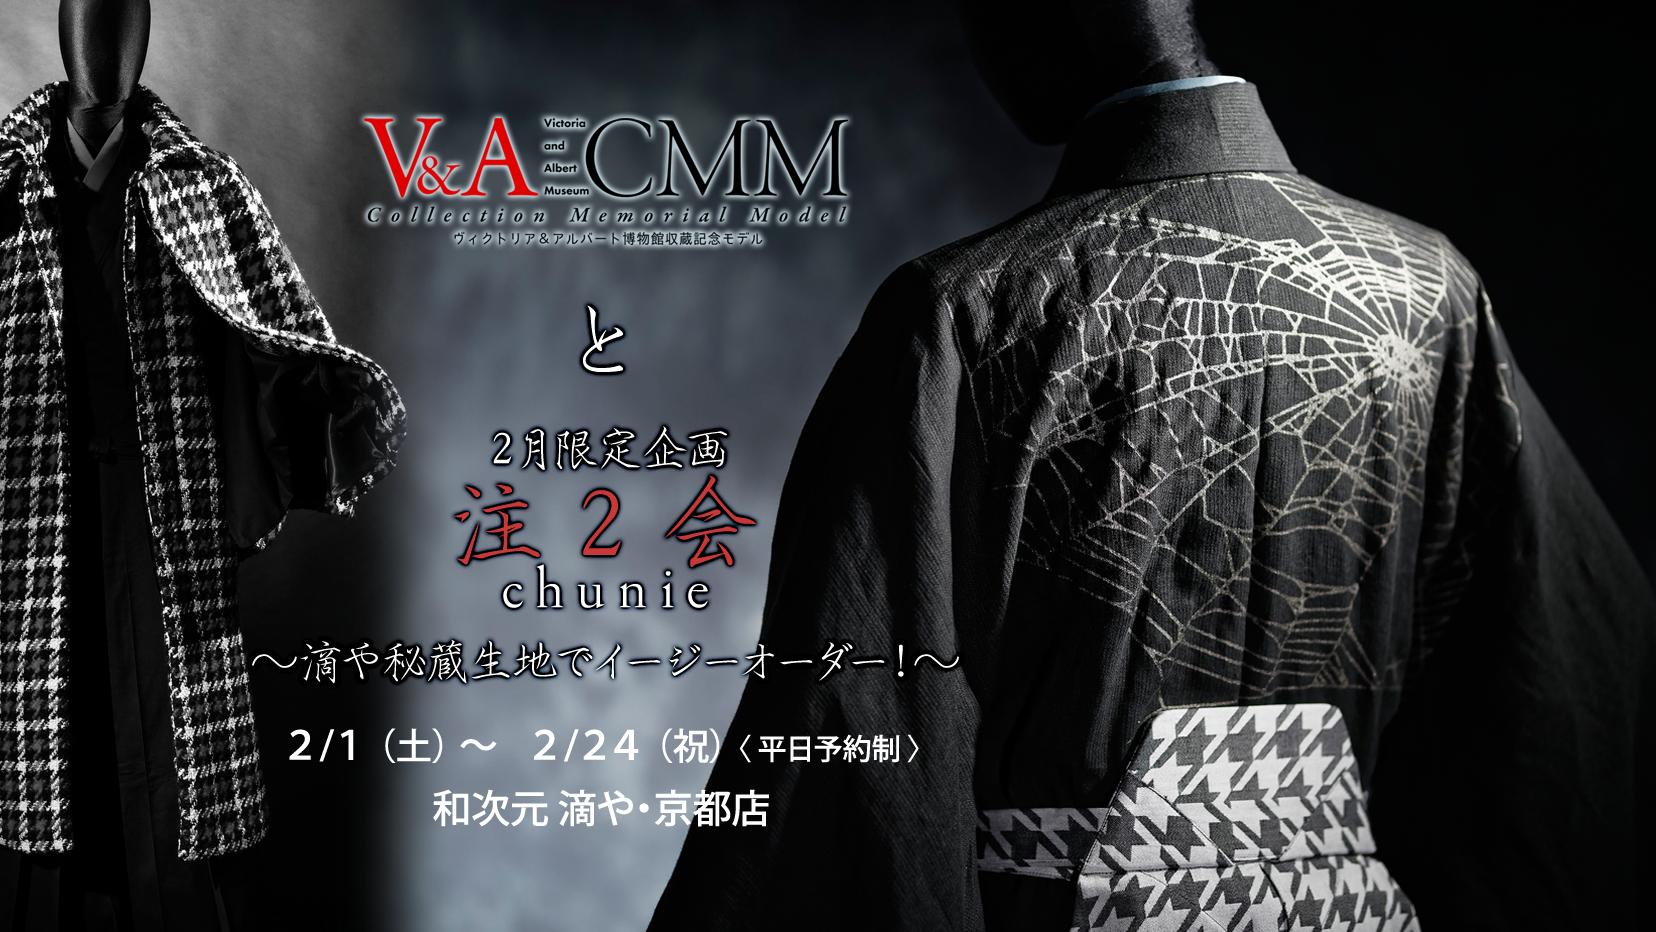 V&A博物館収蔵記念モデルと 注2会'20